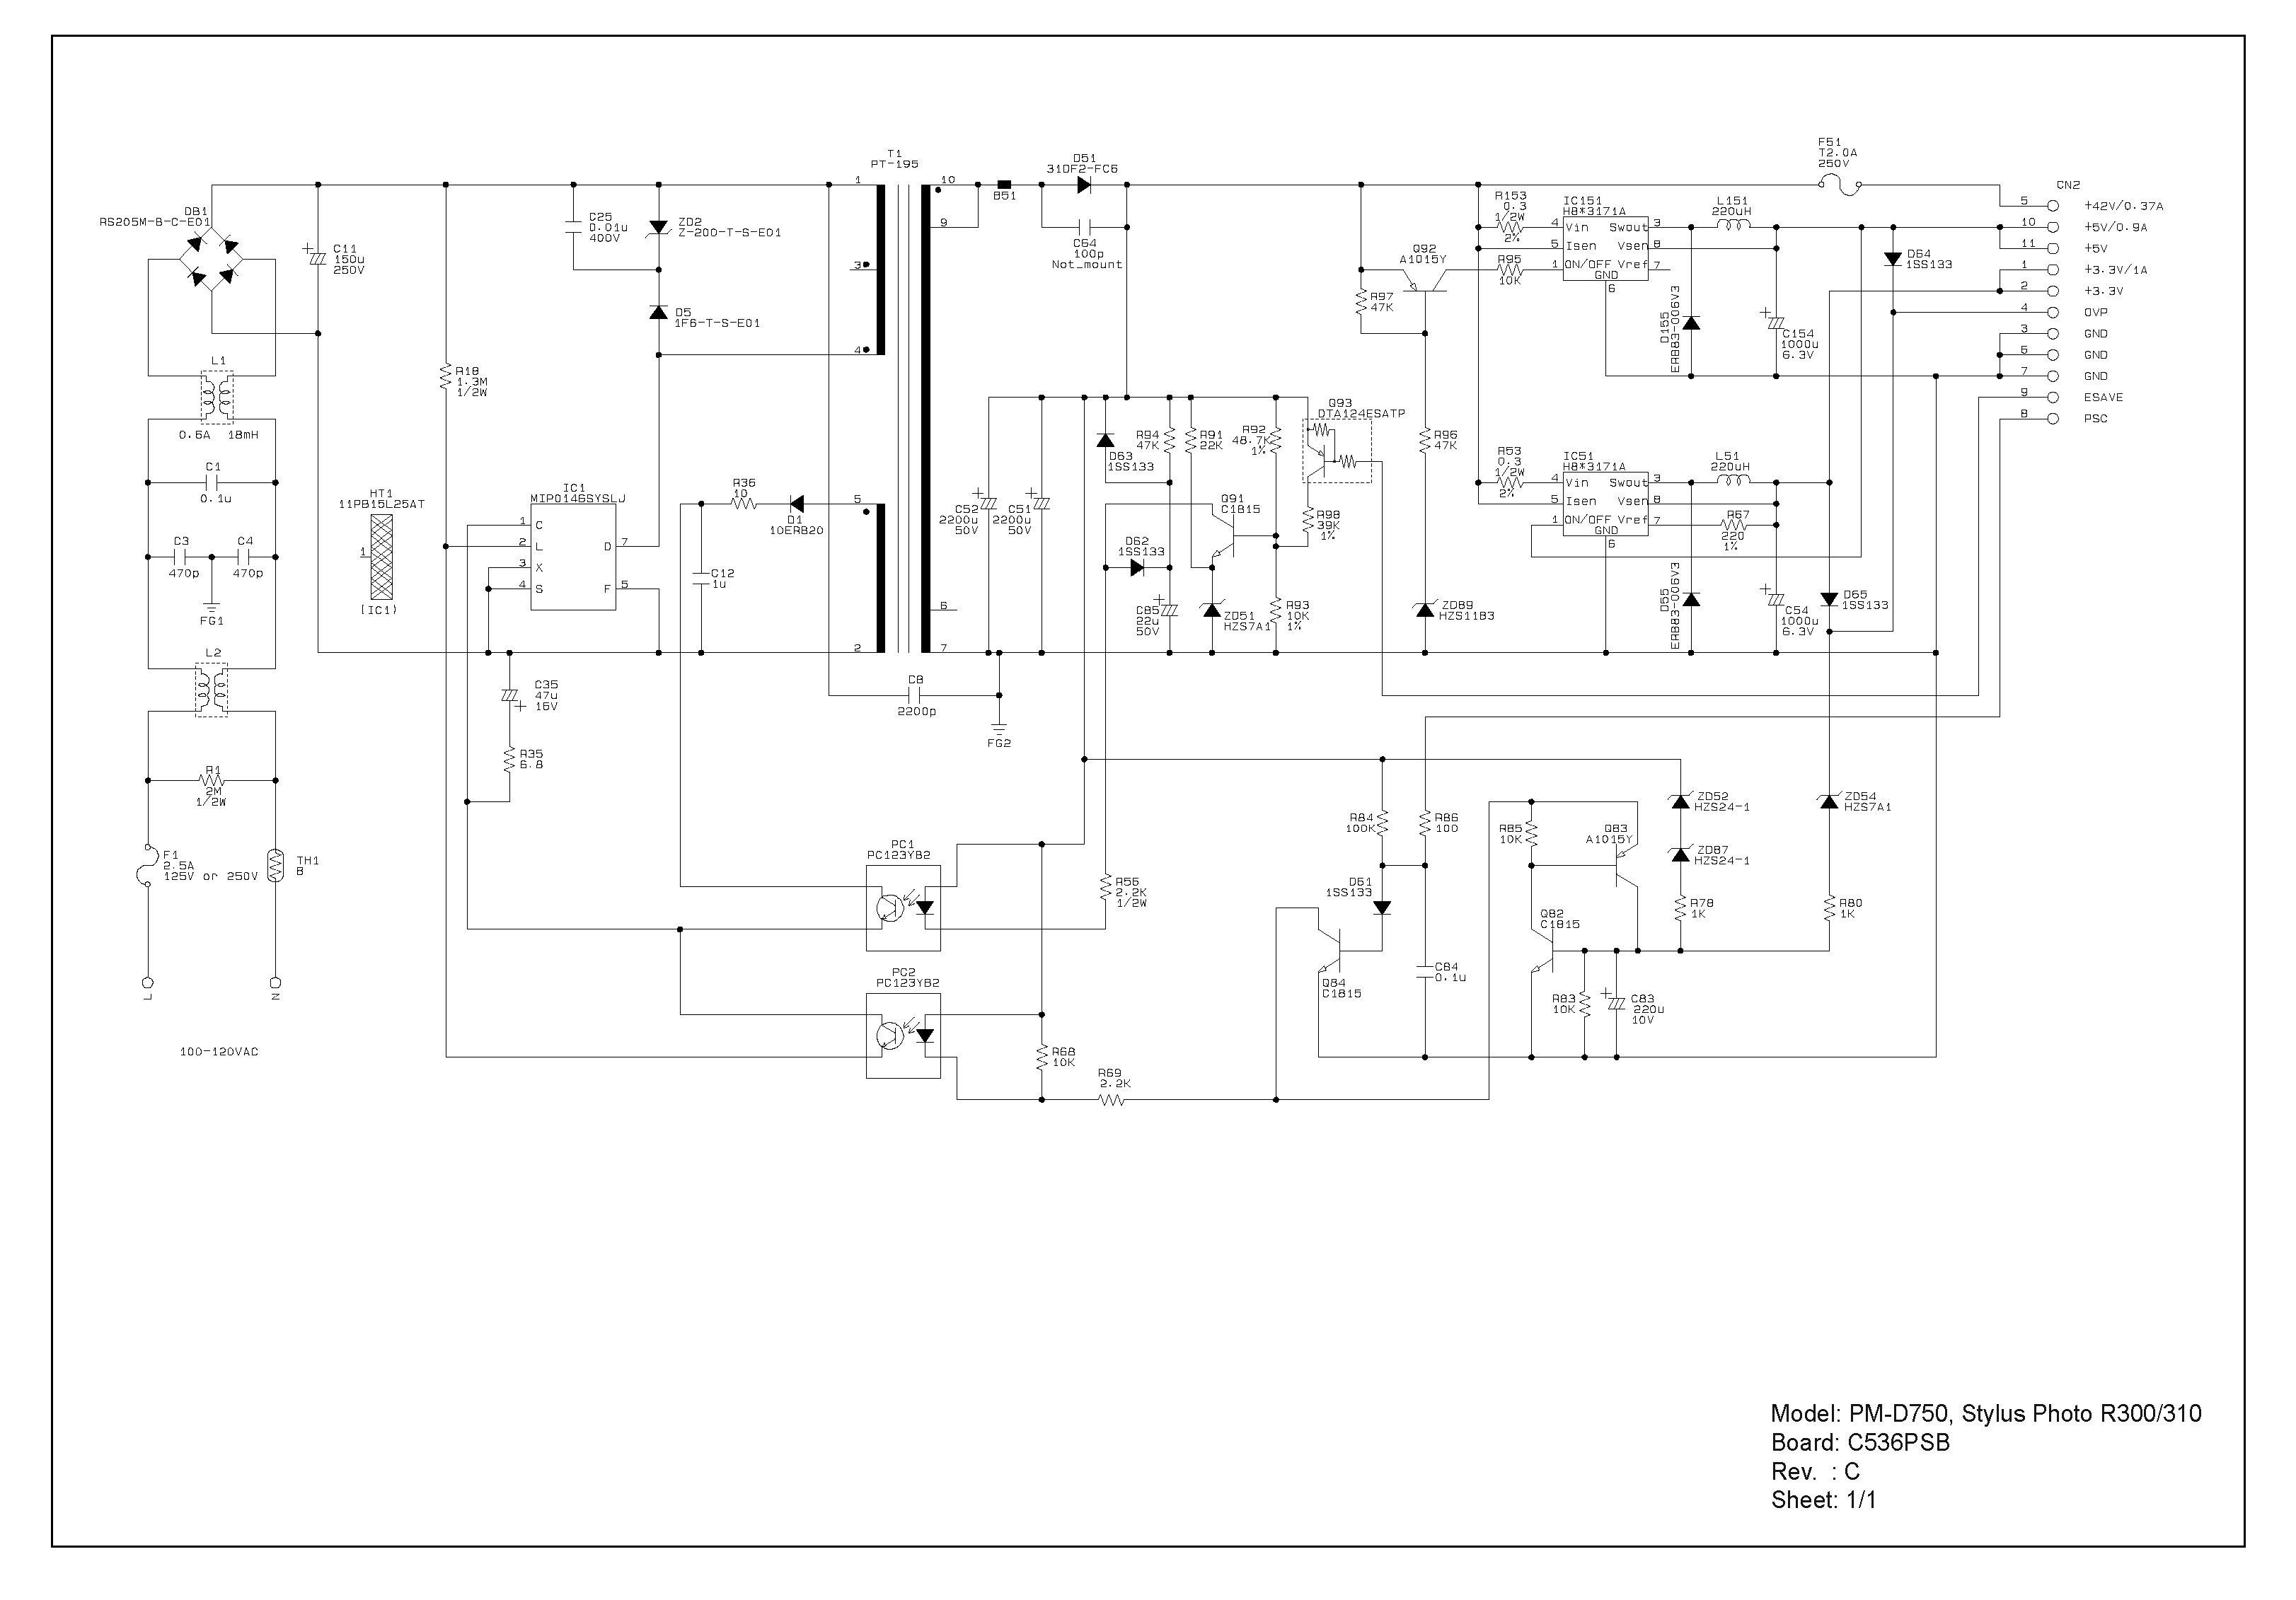 Epson_C536PSE_C536PSB_model_EPS-86E_Страница_1.jpg